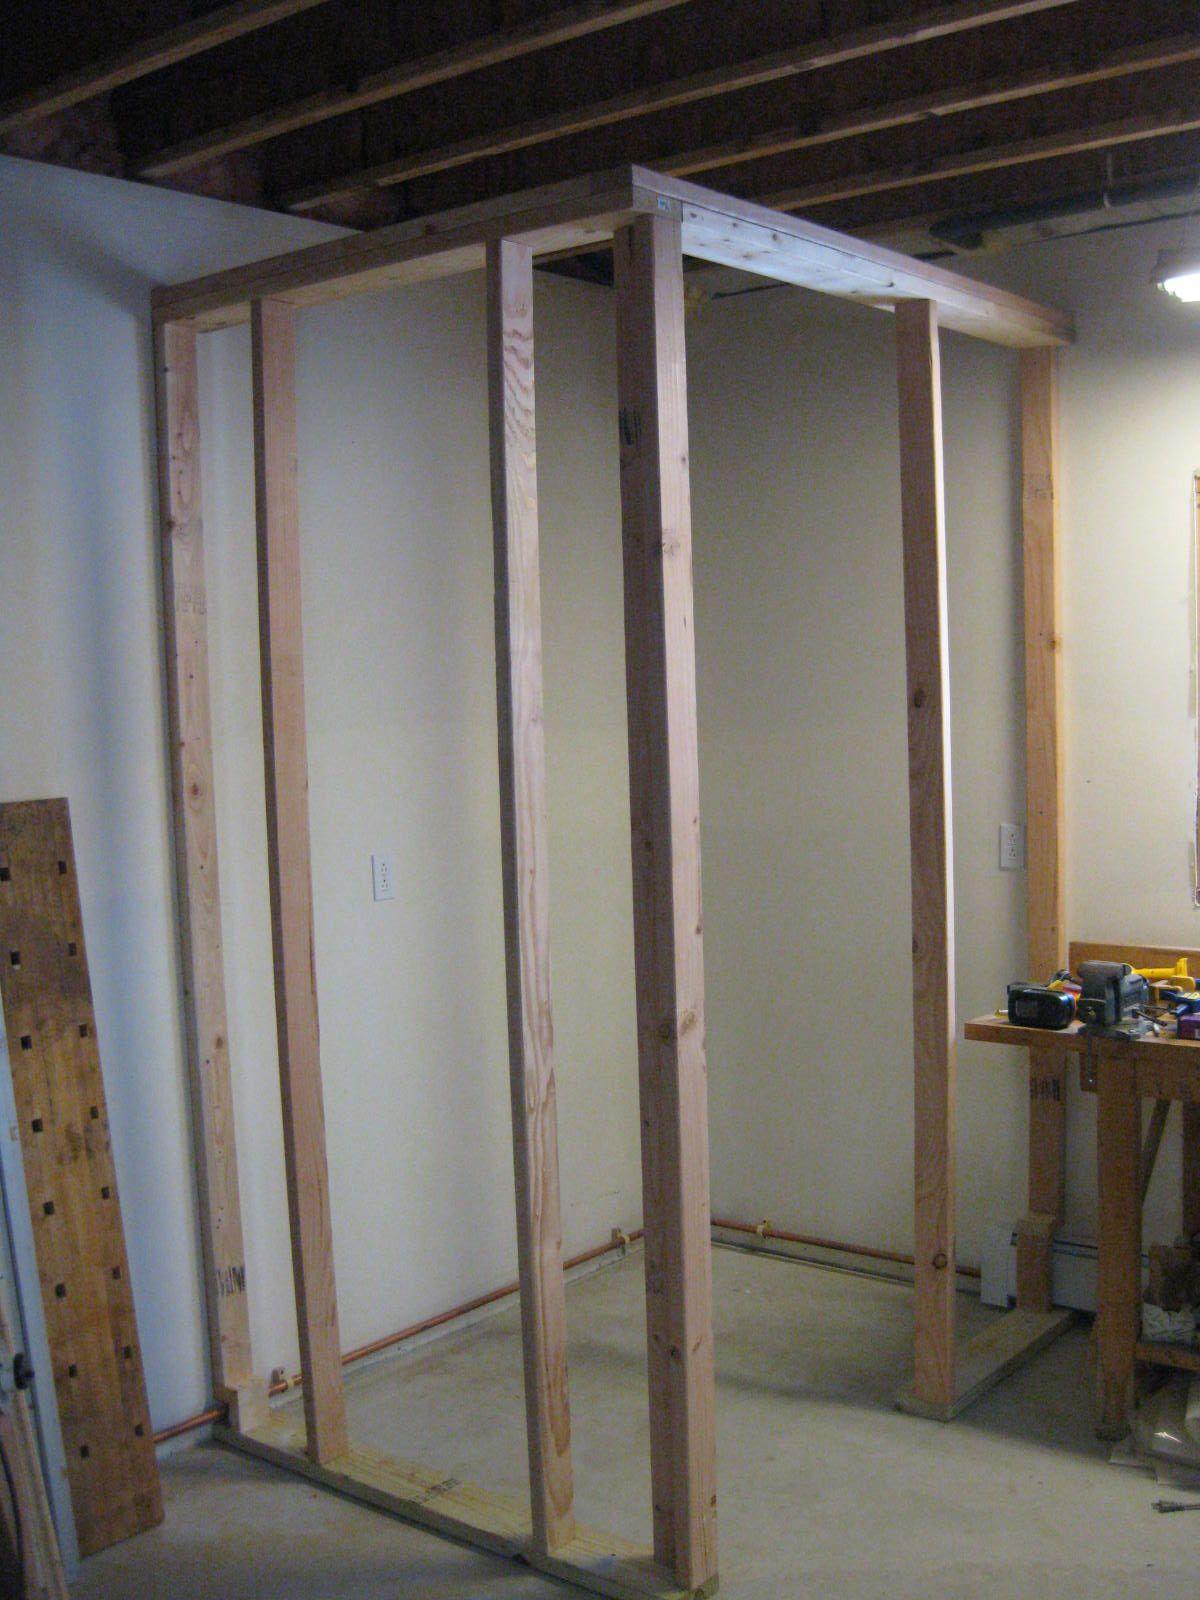 Building A Walk In Cooler Walk In Freezer Attic Renovation Attic Remodel